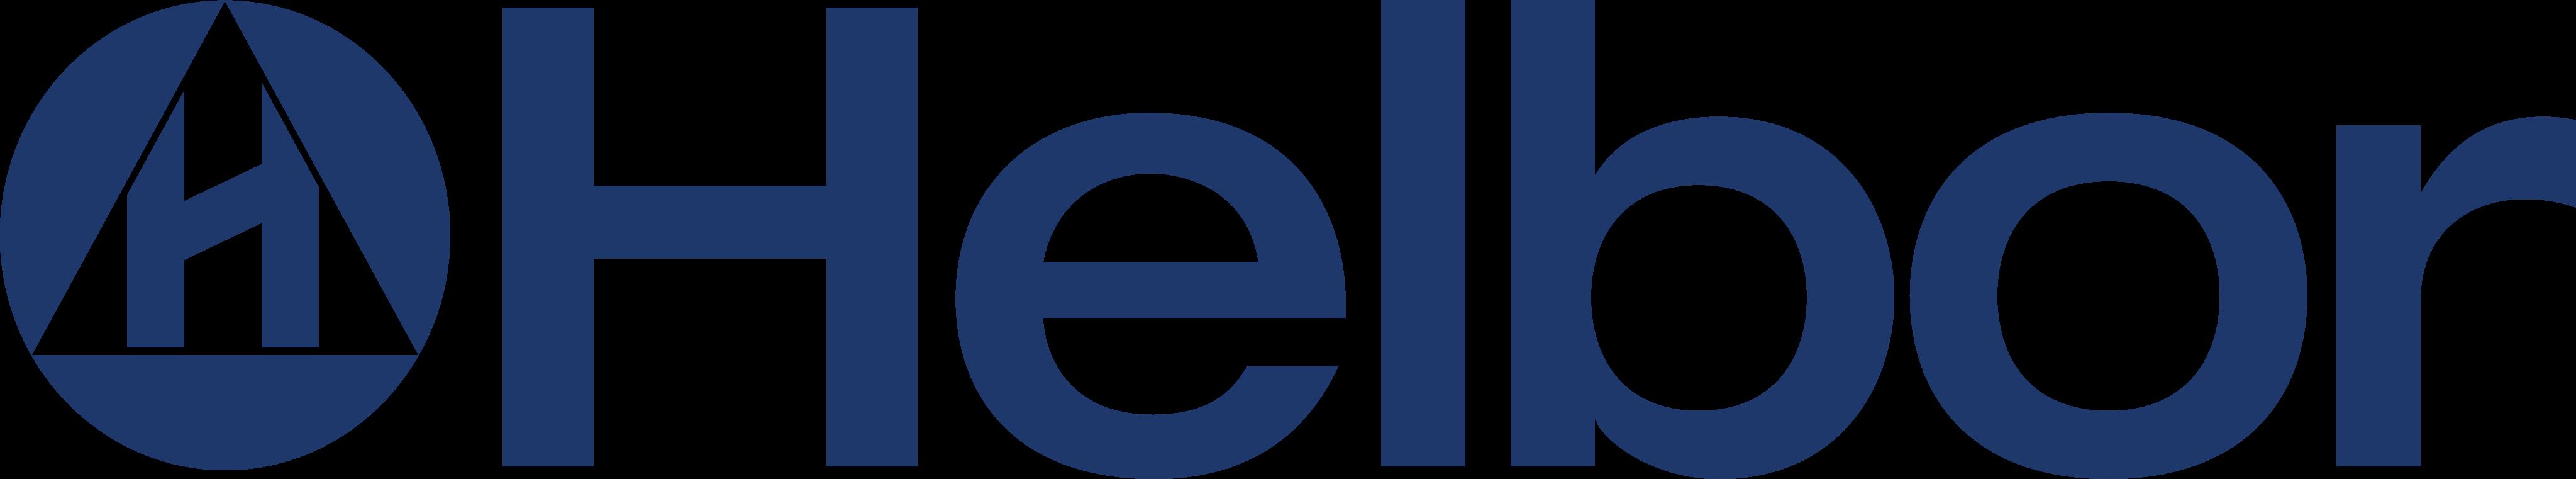 Helbor Logo.